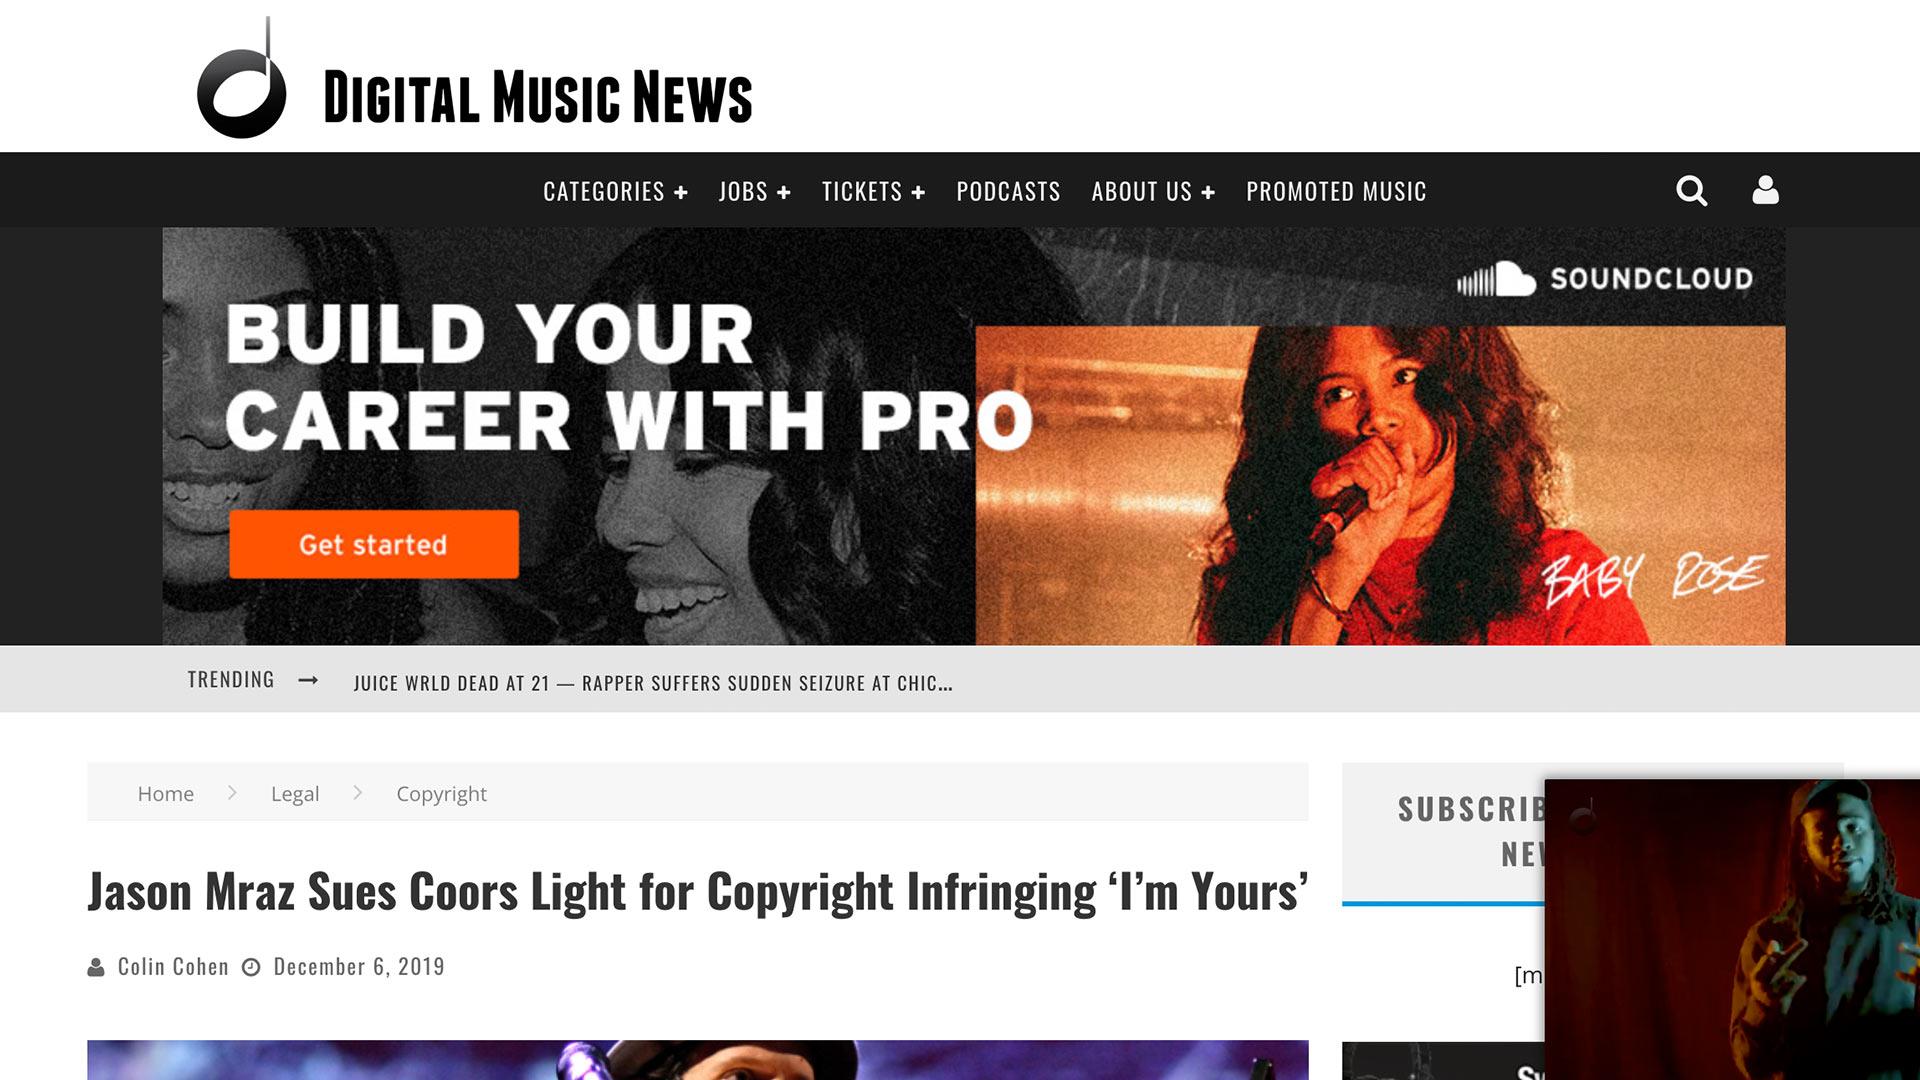 Fairness Rocks News Jason Mraz Sues Coors Light for Copyright Infringing 'I'm Yours'